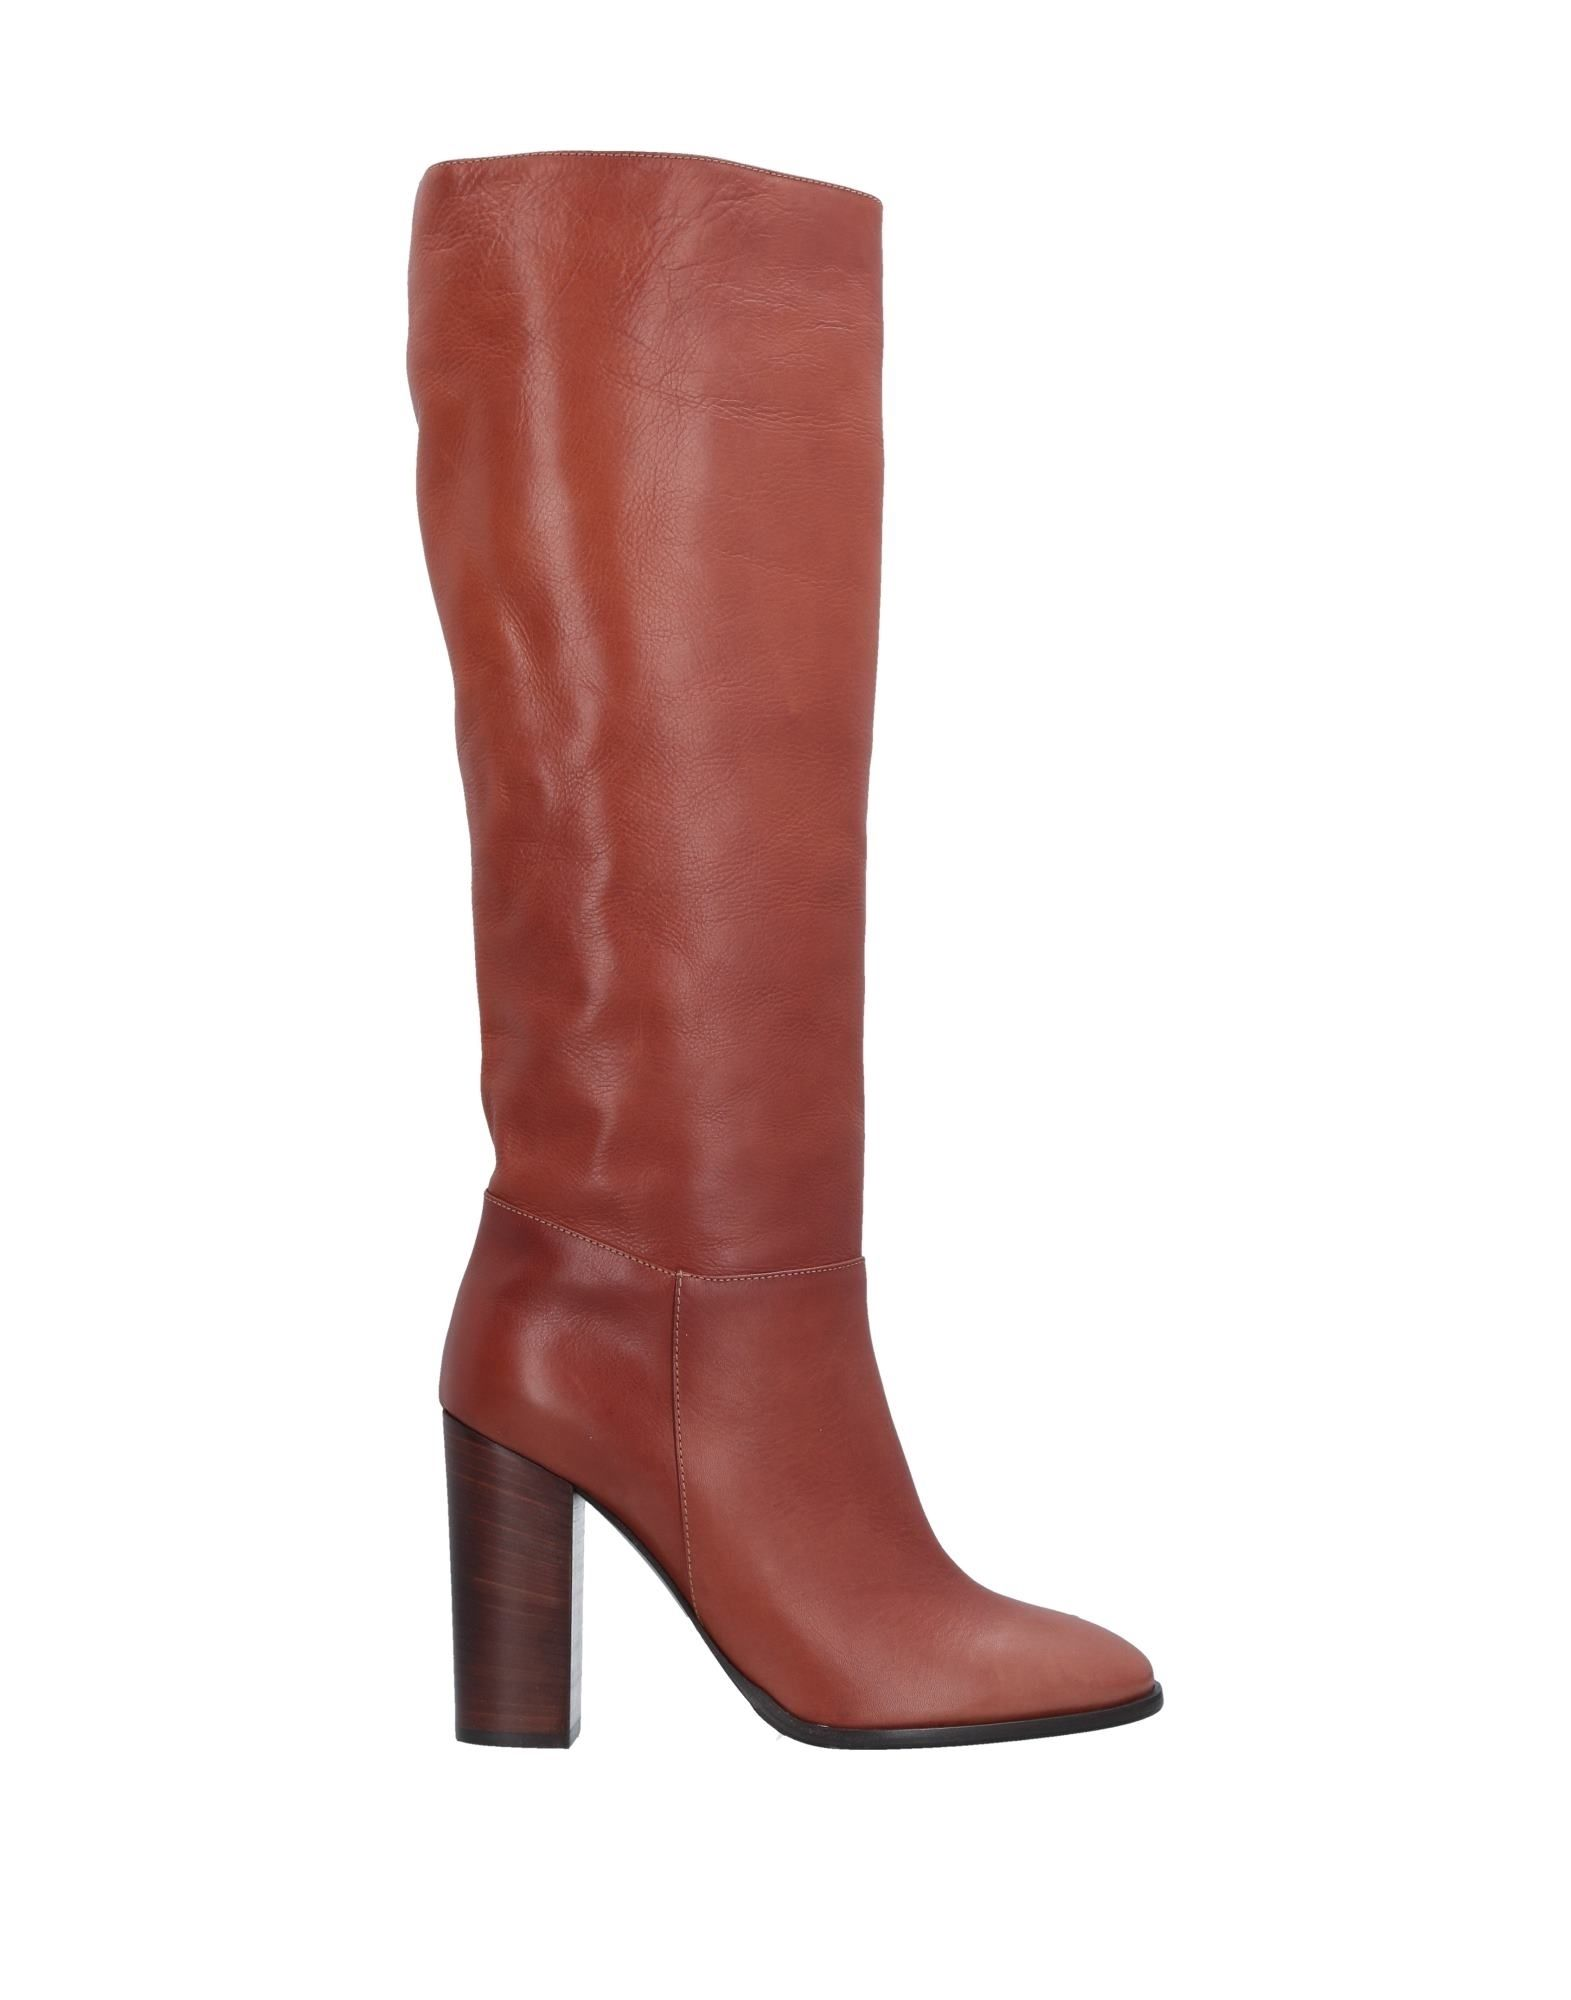 Moda Stivali Jucca Donna - 11515041BV